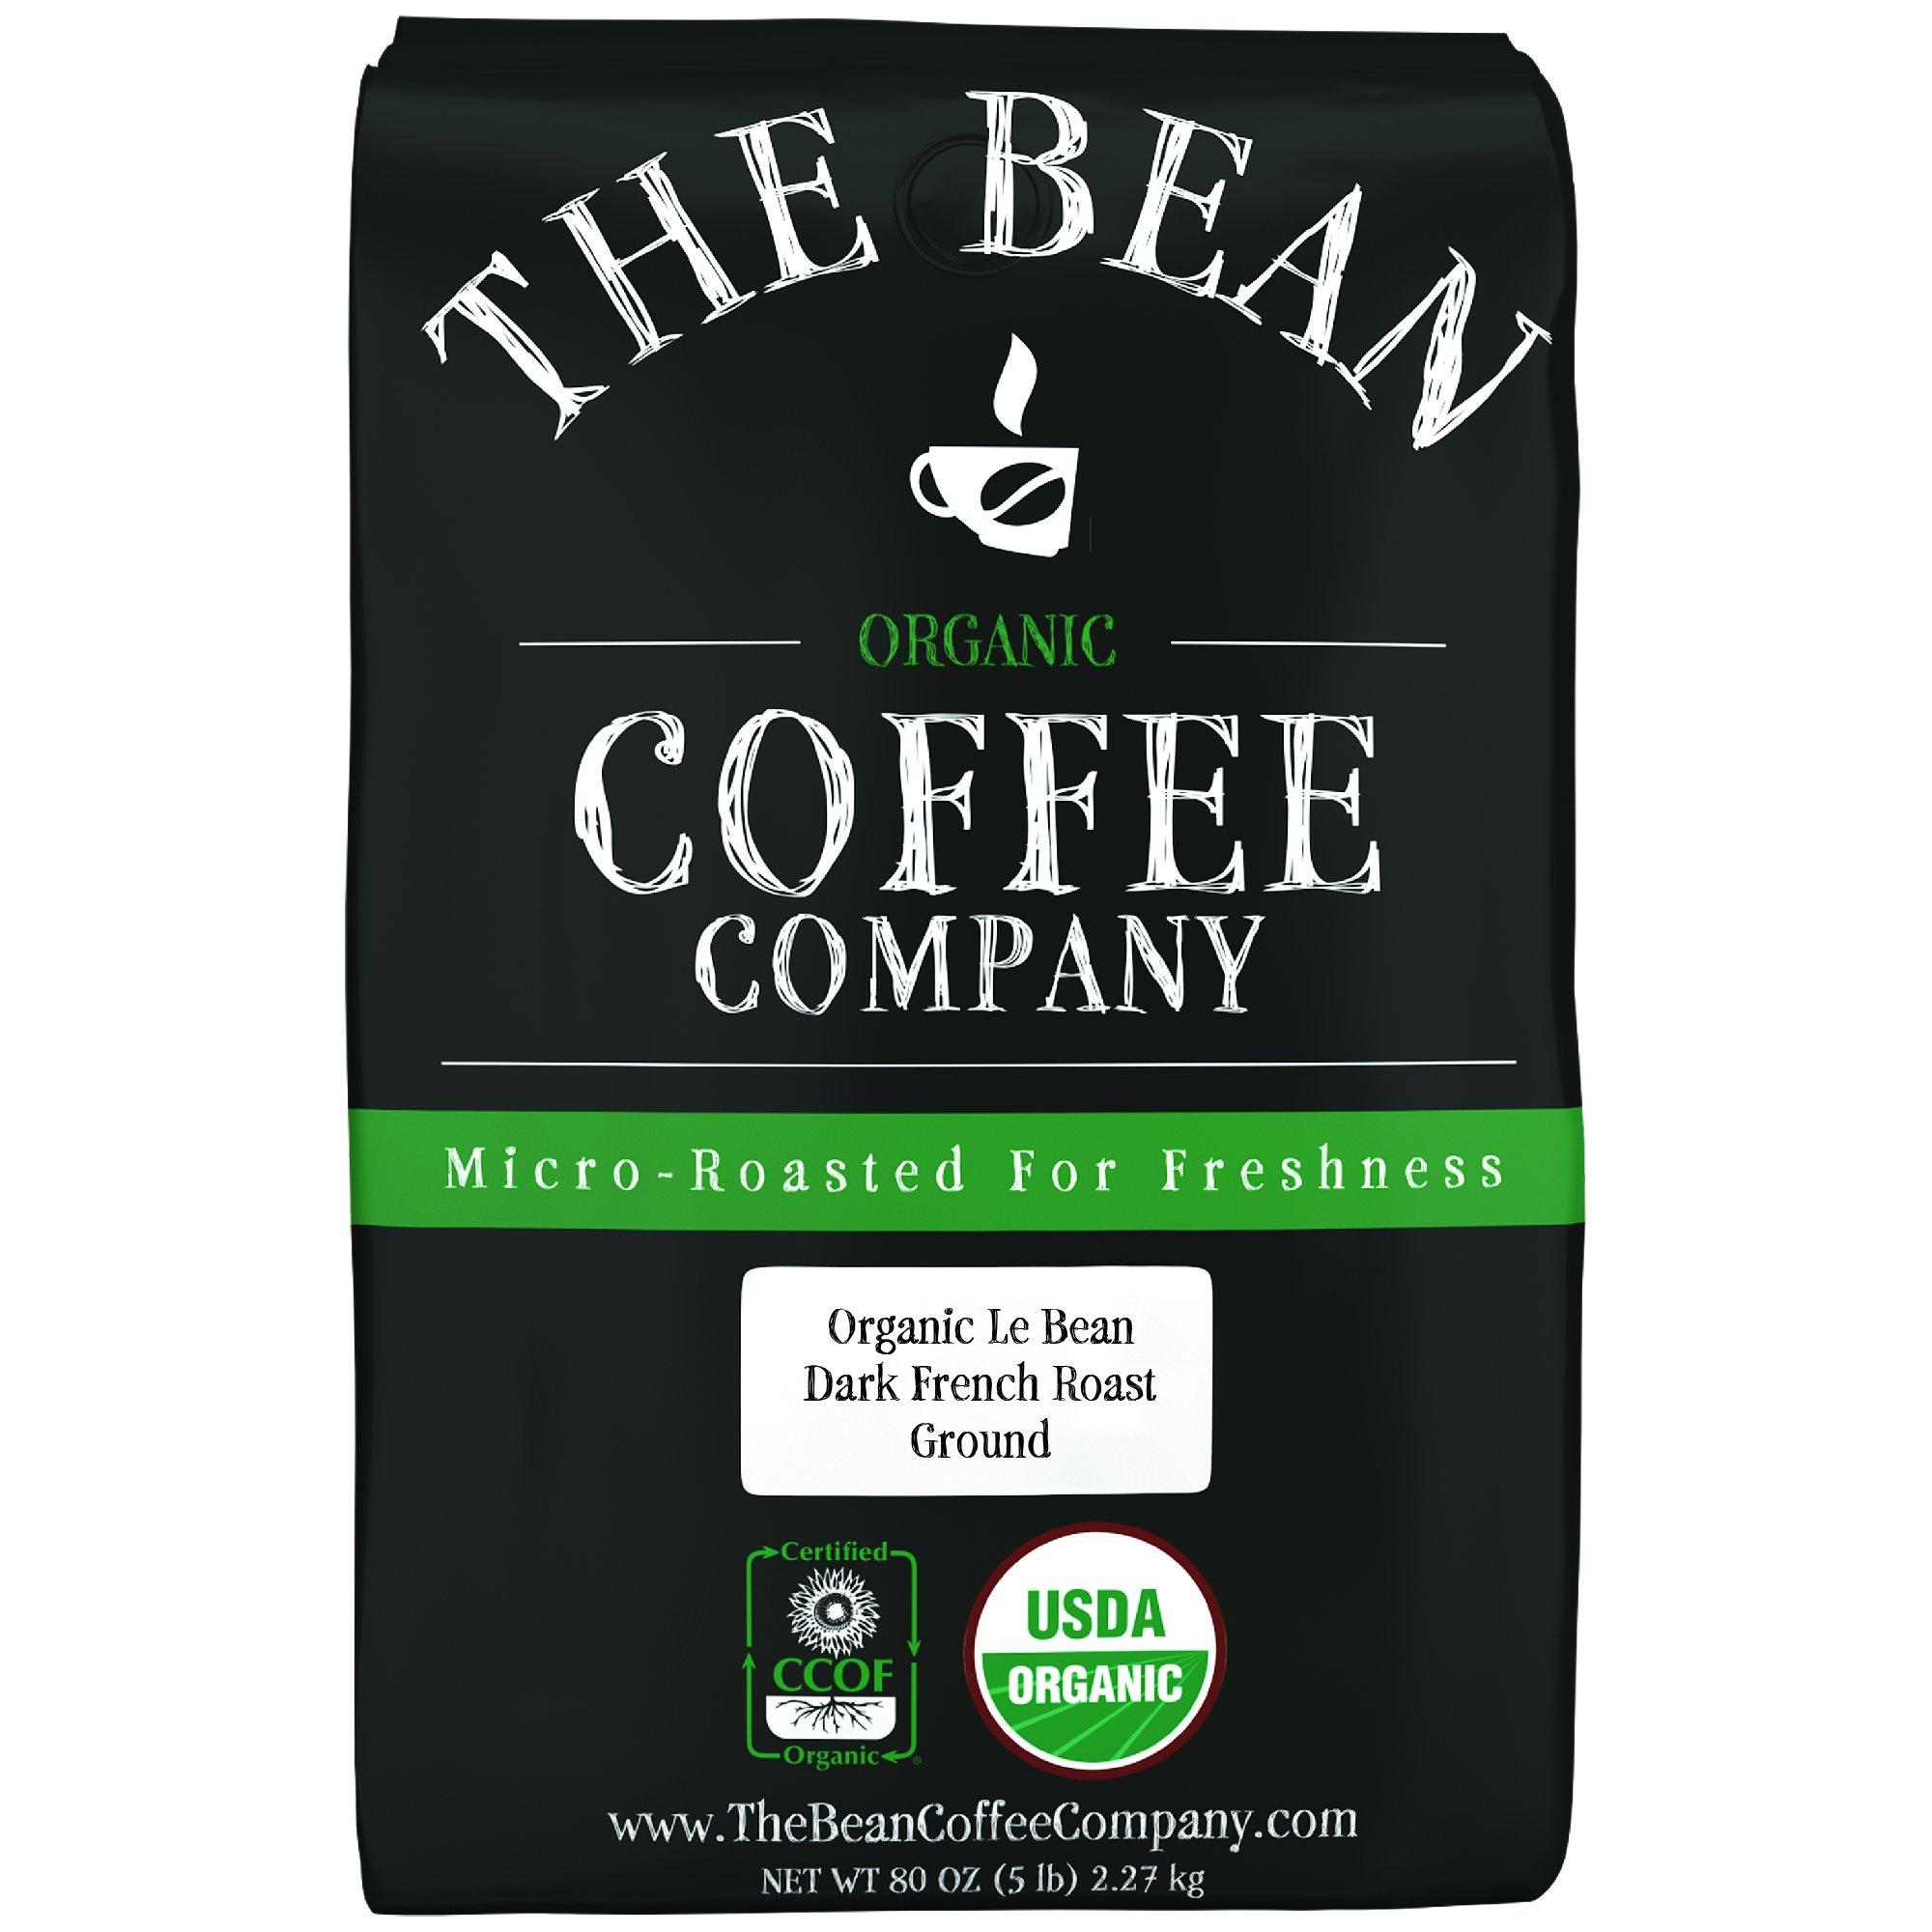 The Bean Coffee Company Organic Le Bean, Dark French Roast, Ground, 5-Pound Bag